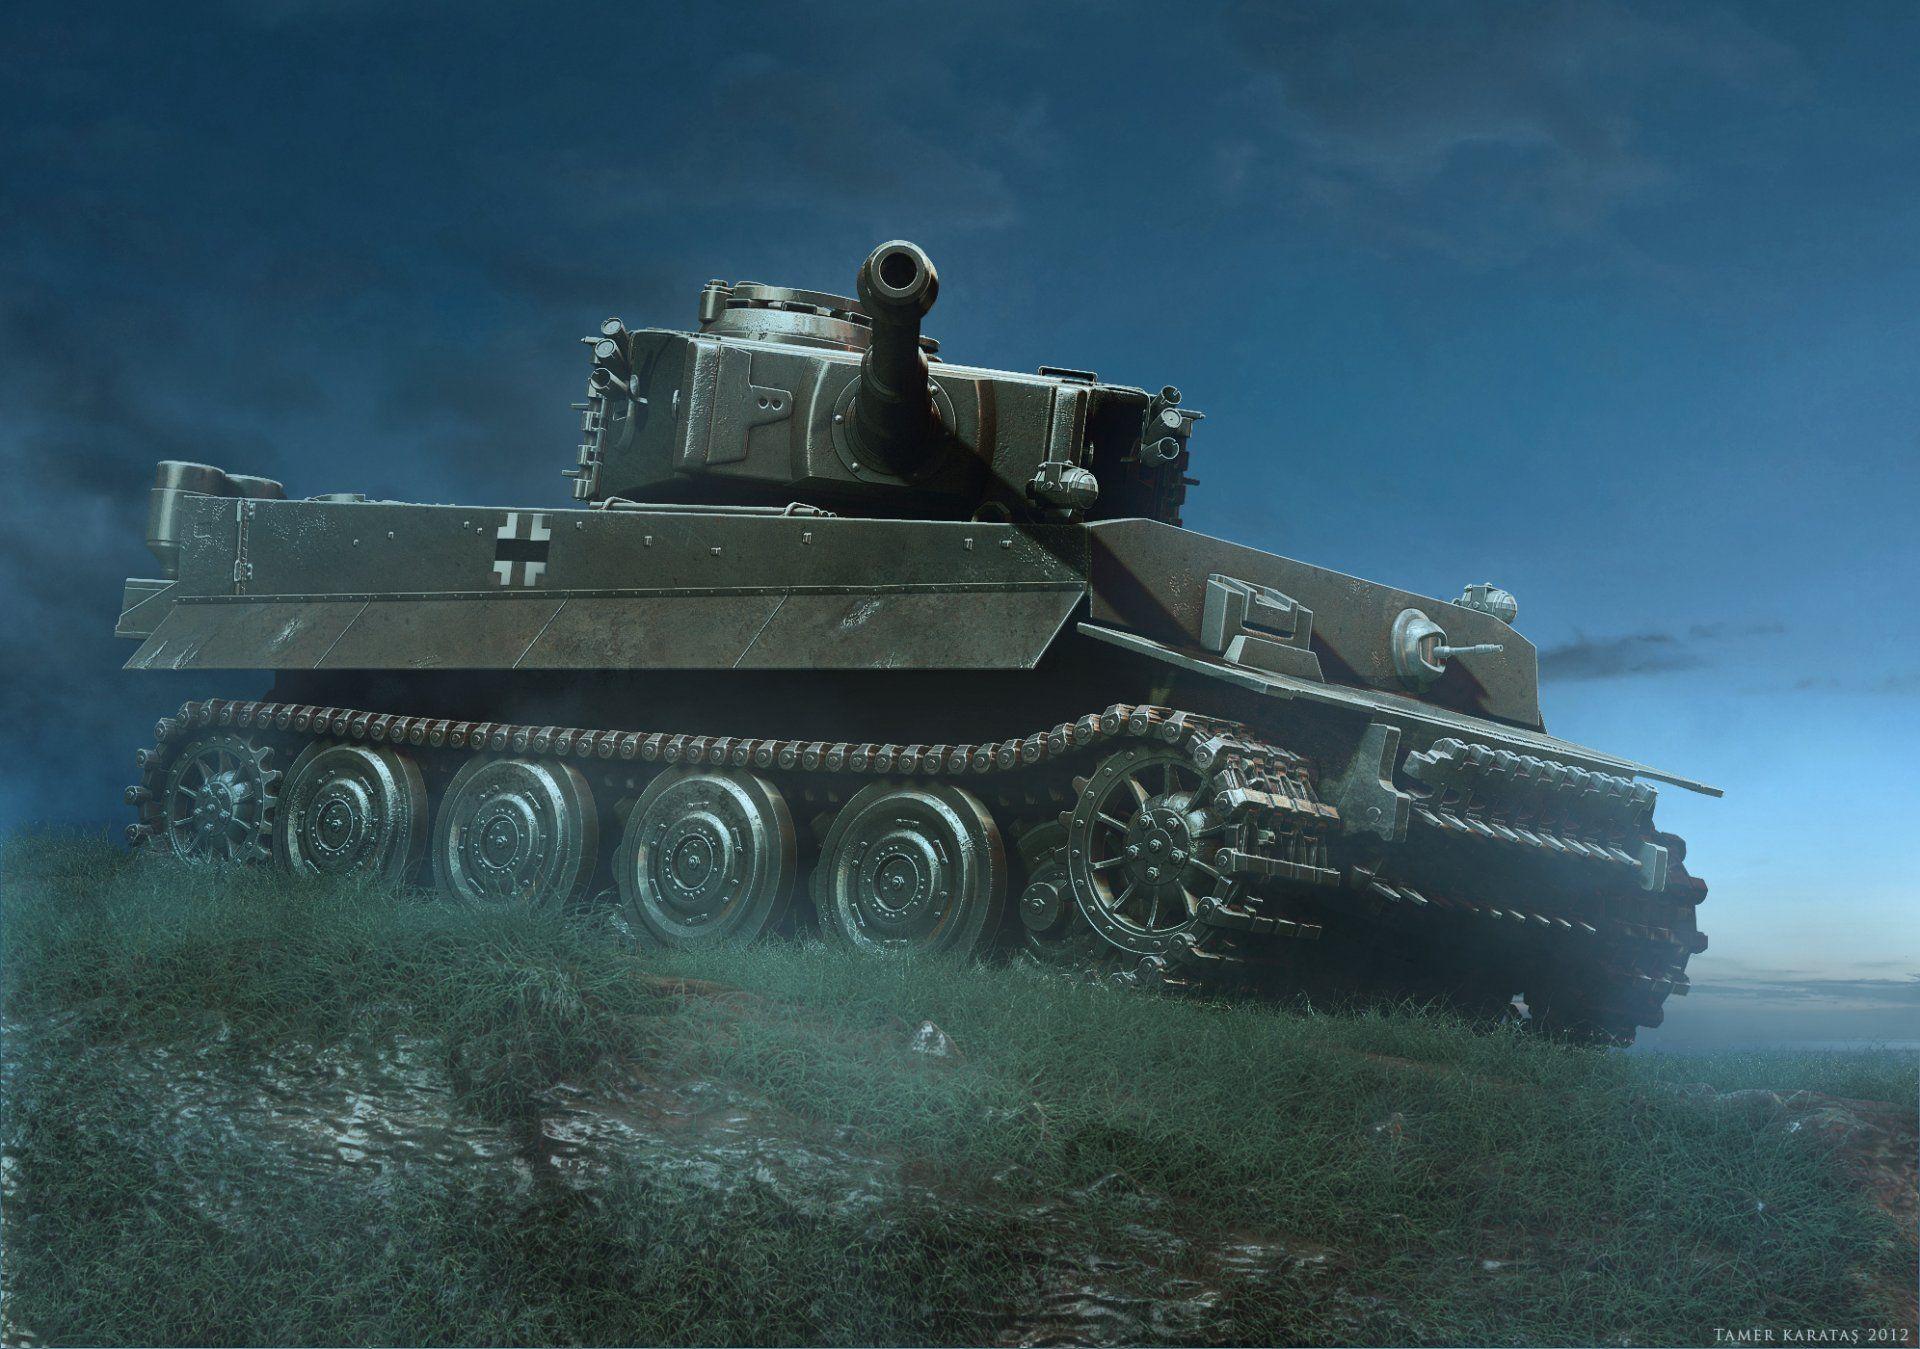 King Tiger Tank Wallpaper Tiger tank, Tank wallpaper